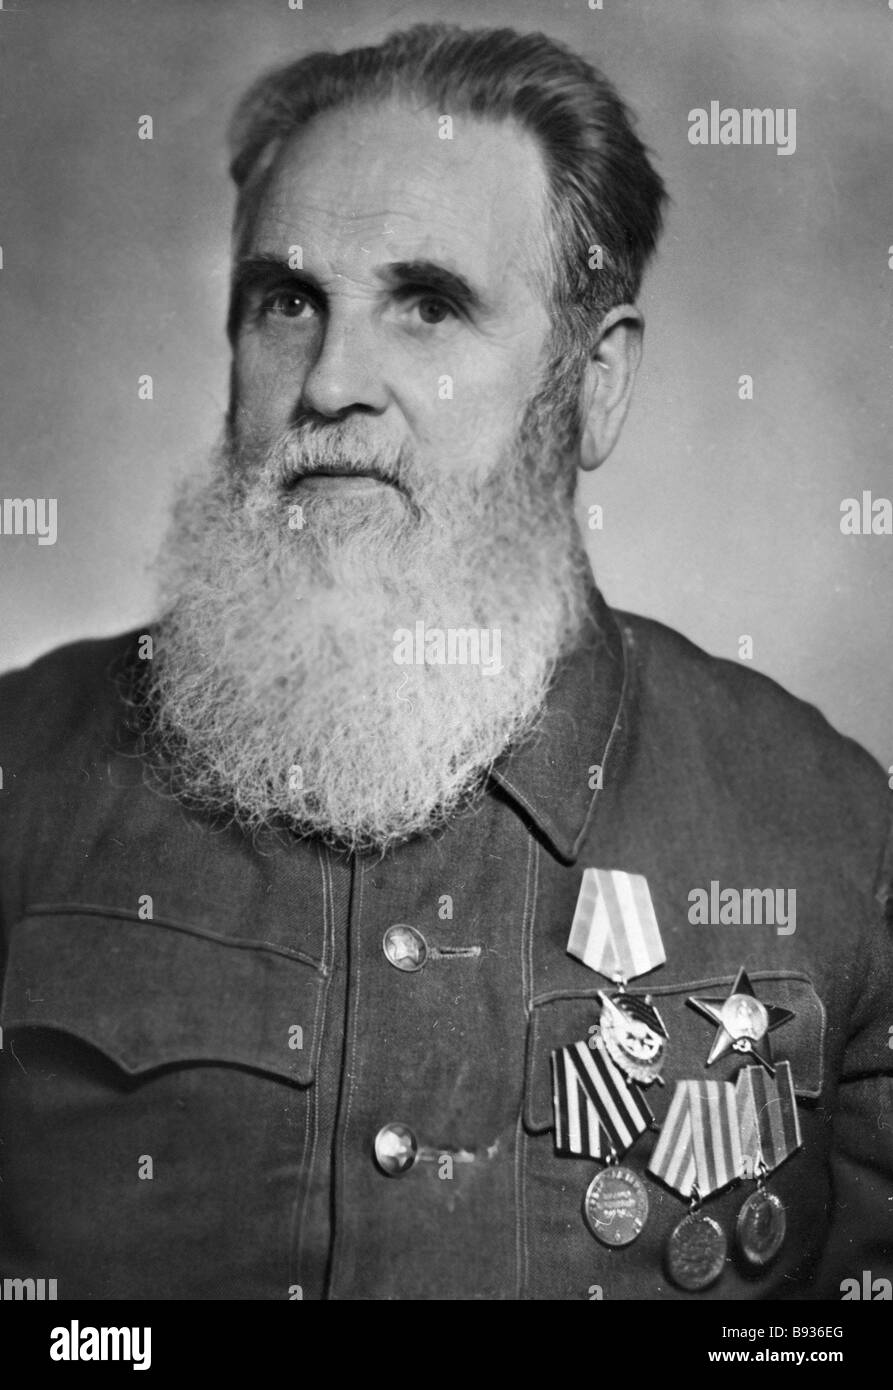 Veteran of three wars former military pilot Ivan Chuchin - Stock Image